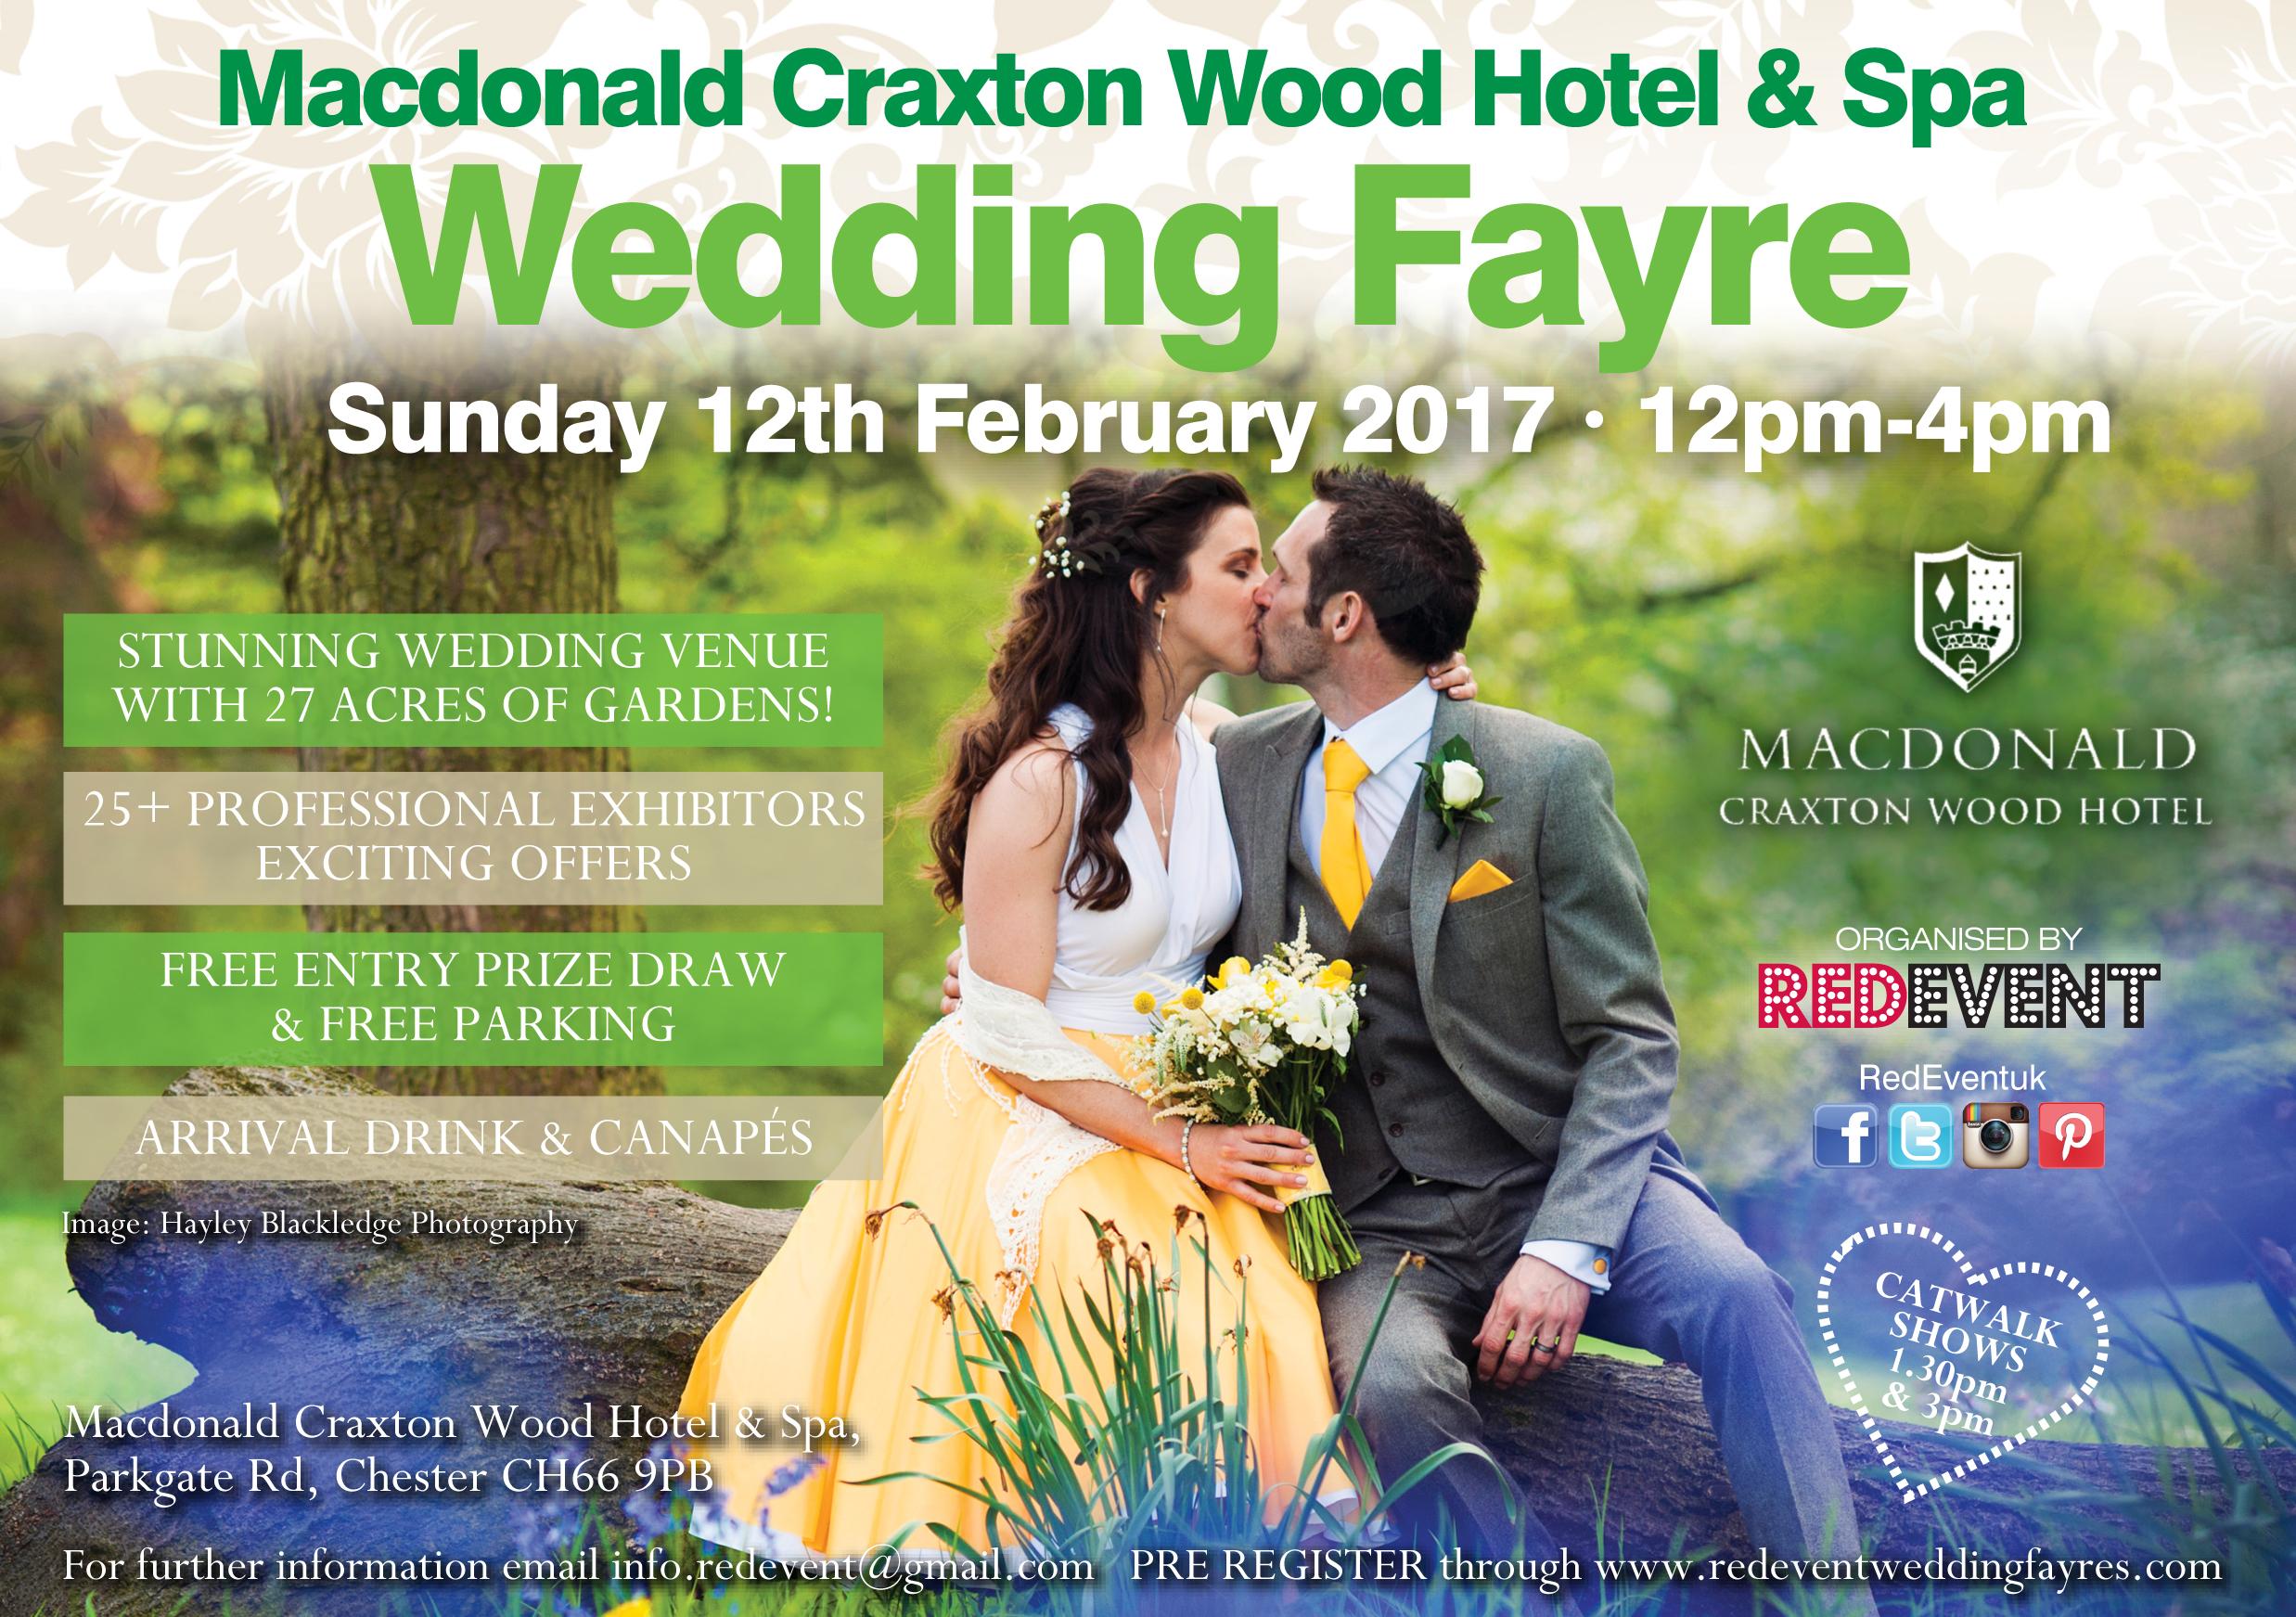 2. Macdonald Craxton Wood Hotel & Spa Spring 2017 Wedding Fayre Wirral, North West Wedding Fayre, Chester Wedding Fair, MErseyside, Cheshire Red Event.jpg